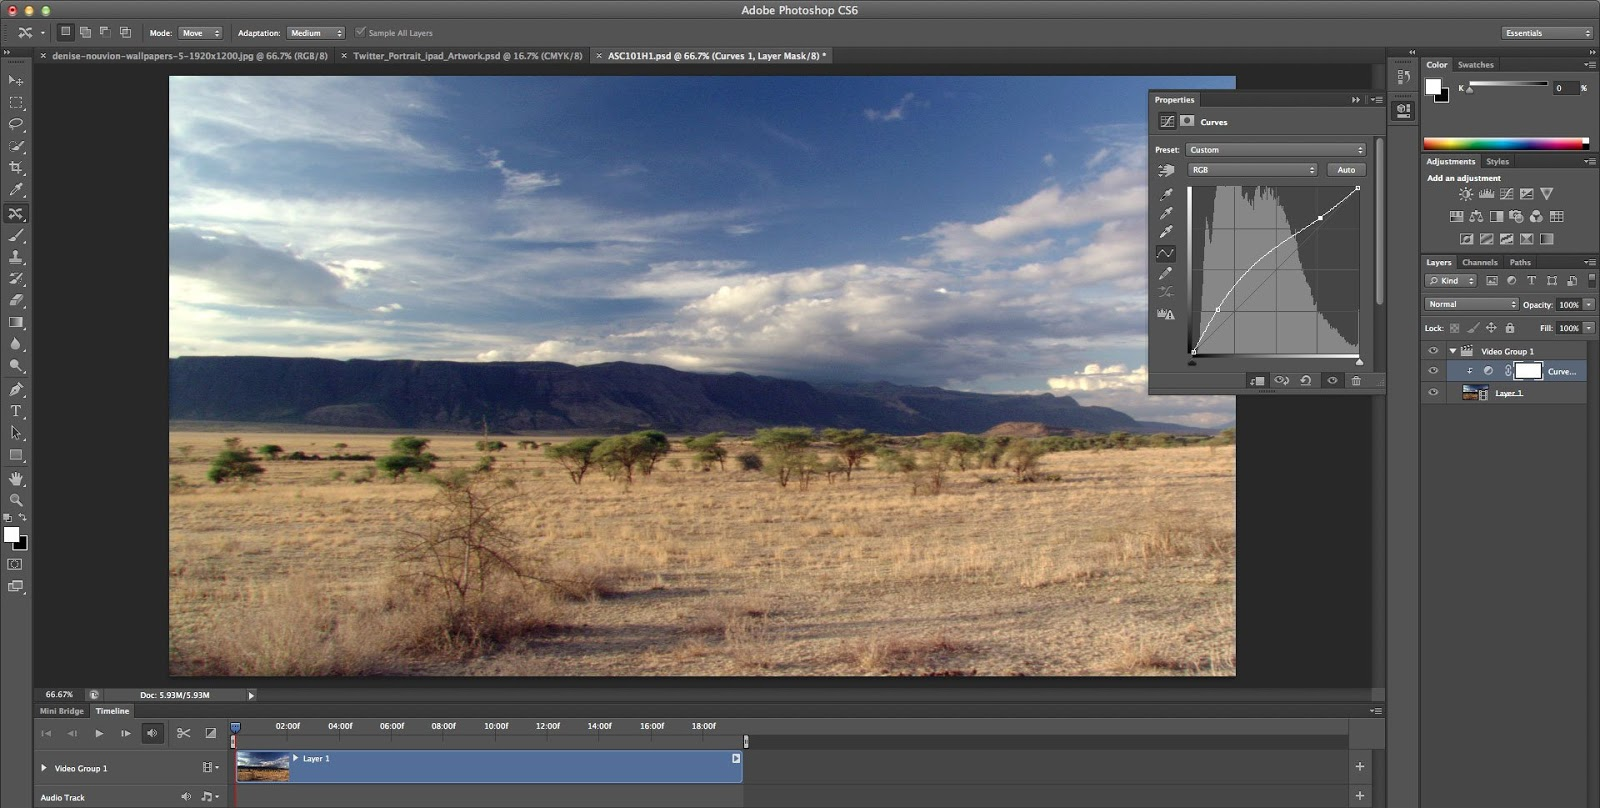 Download Photoshop CS 4 free full version 32 & 64 bit for windows 7 8